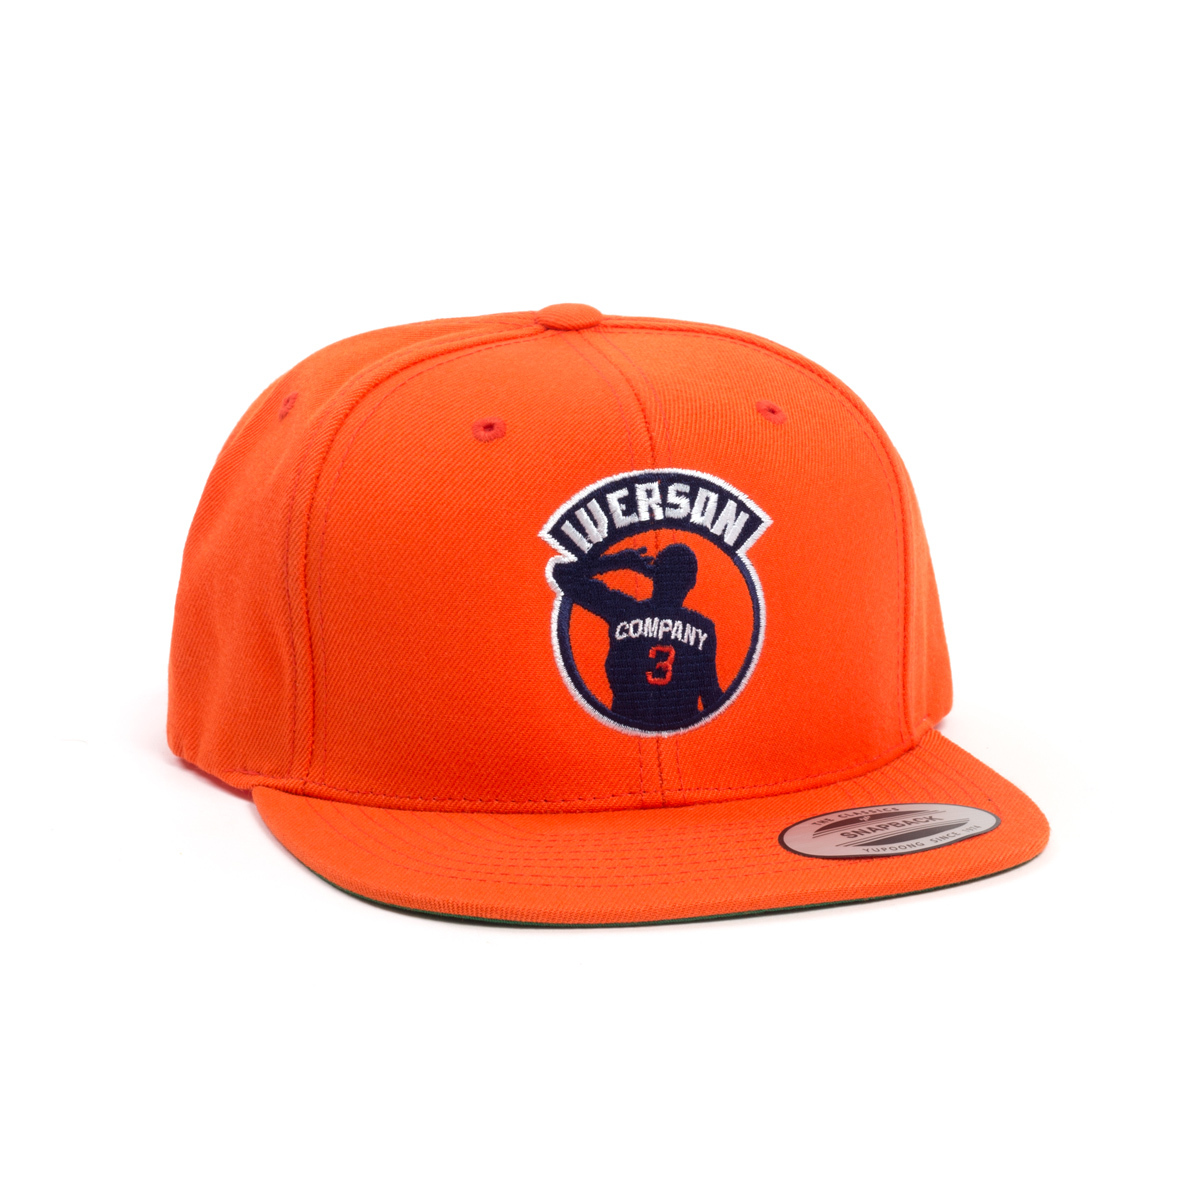 3's COMPANY - IVERSON ORANGE FLATBRIM HAT